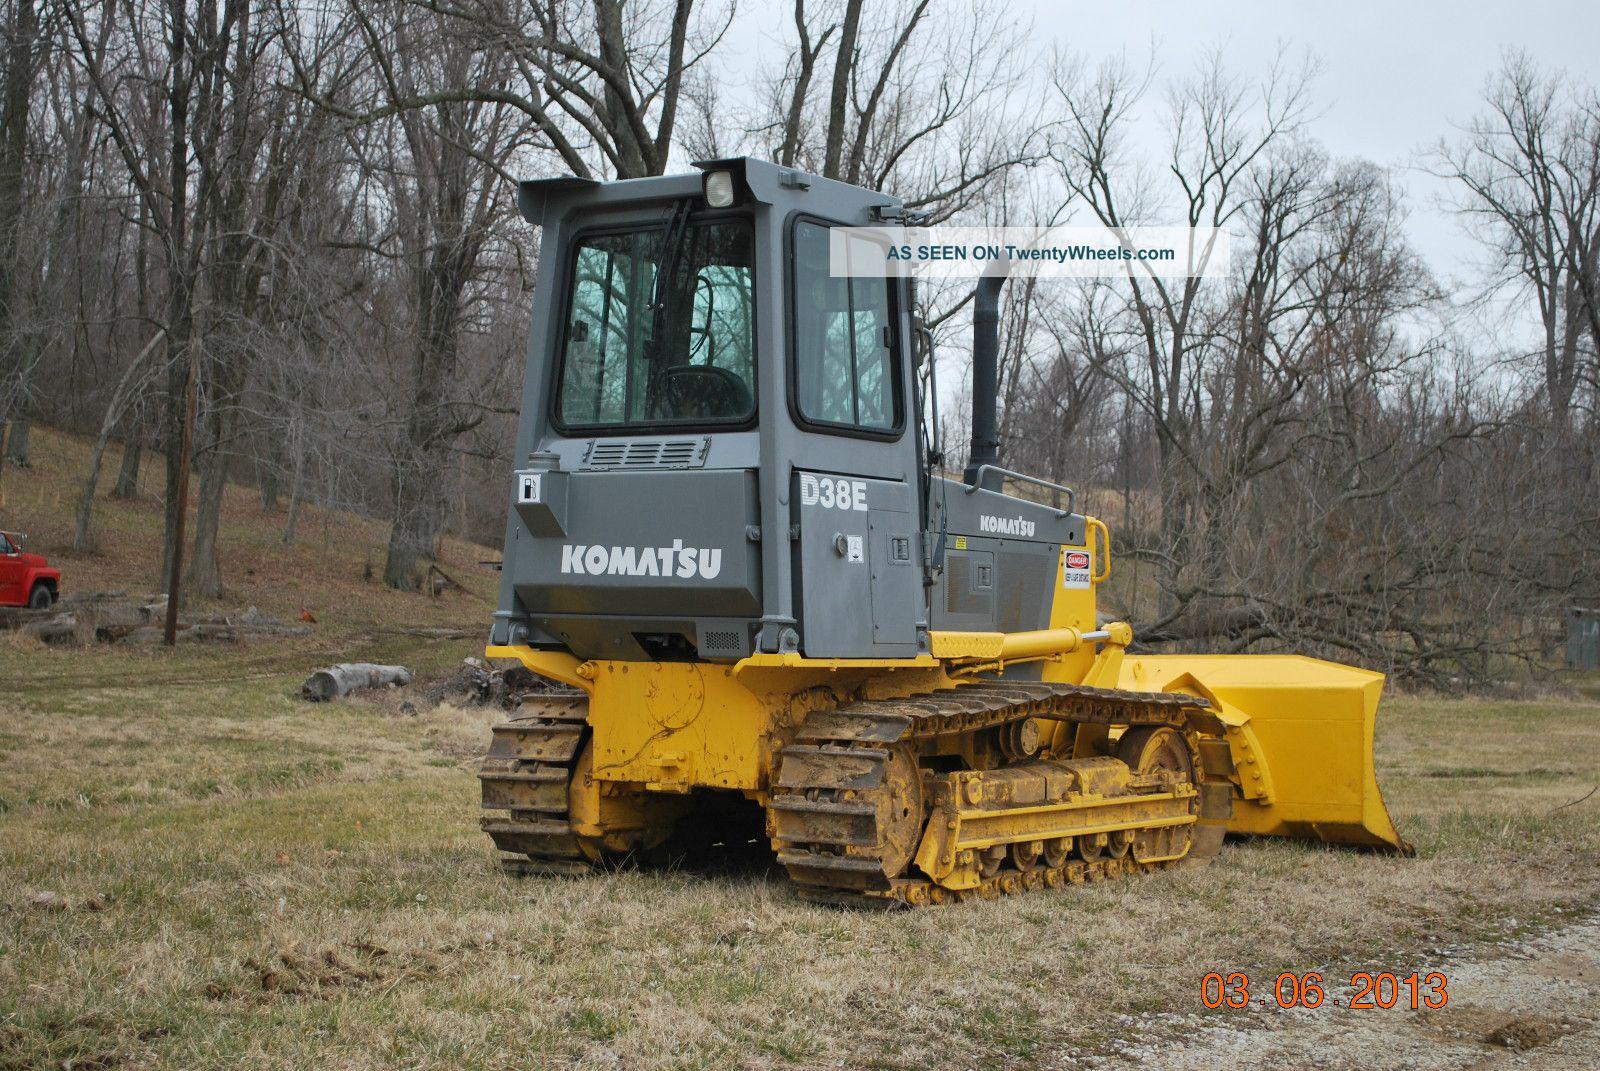 Komatsu D38e Dozer Loader Tractor 6 Way Blade Crawler Bob Cat Track